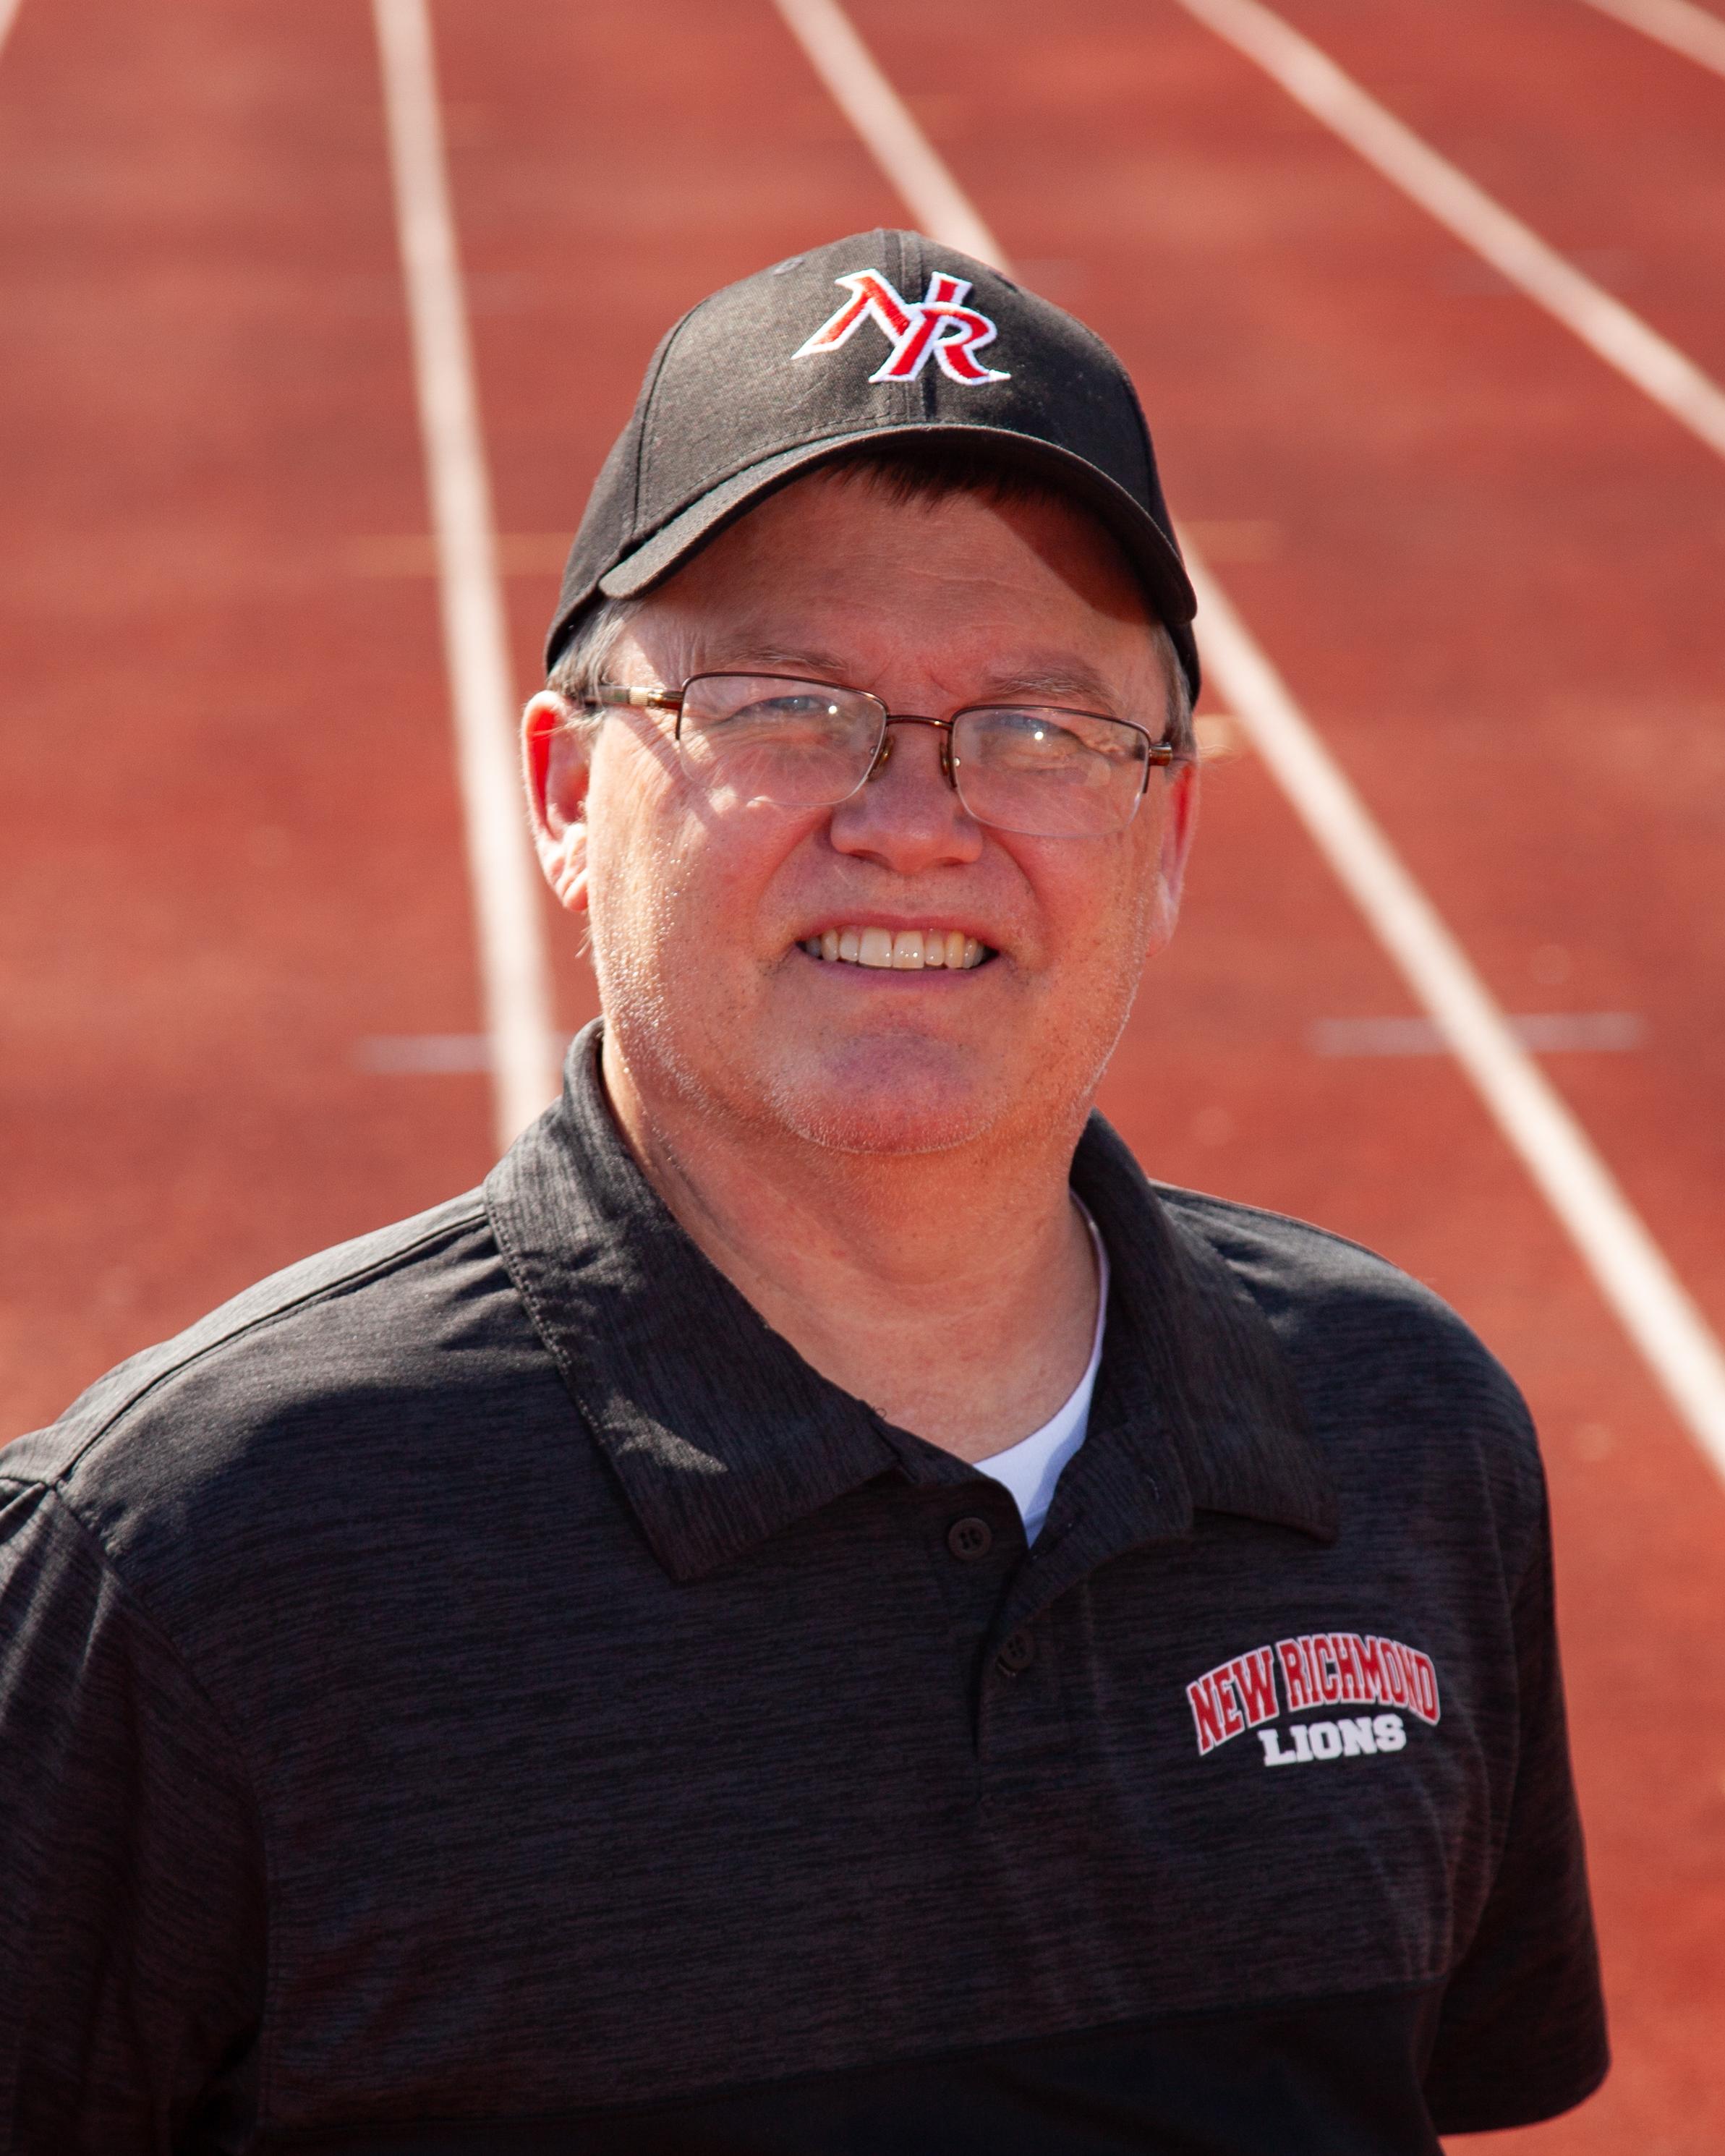 Head Girls Track Coach Doug Smiddy